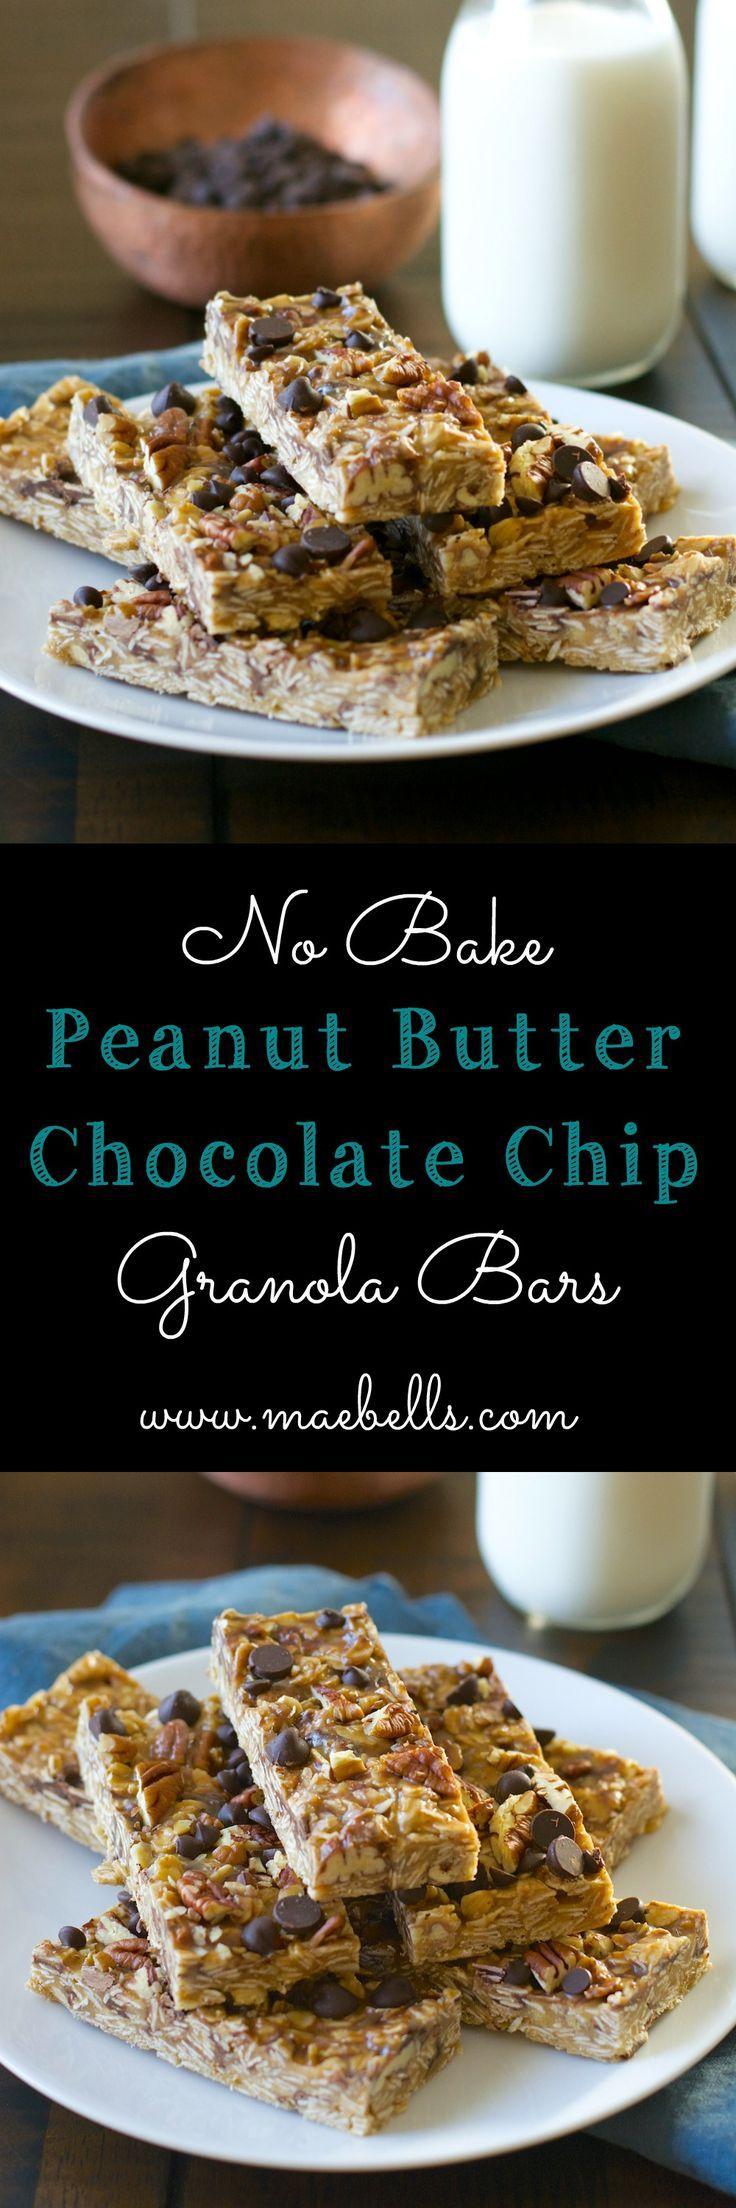 Peanut Butter Granola Bars | Recipe | Chocolate chips, Gluten free and ...